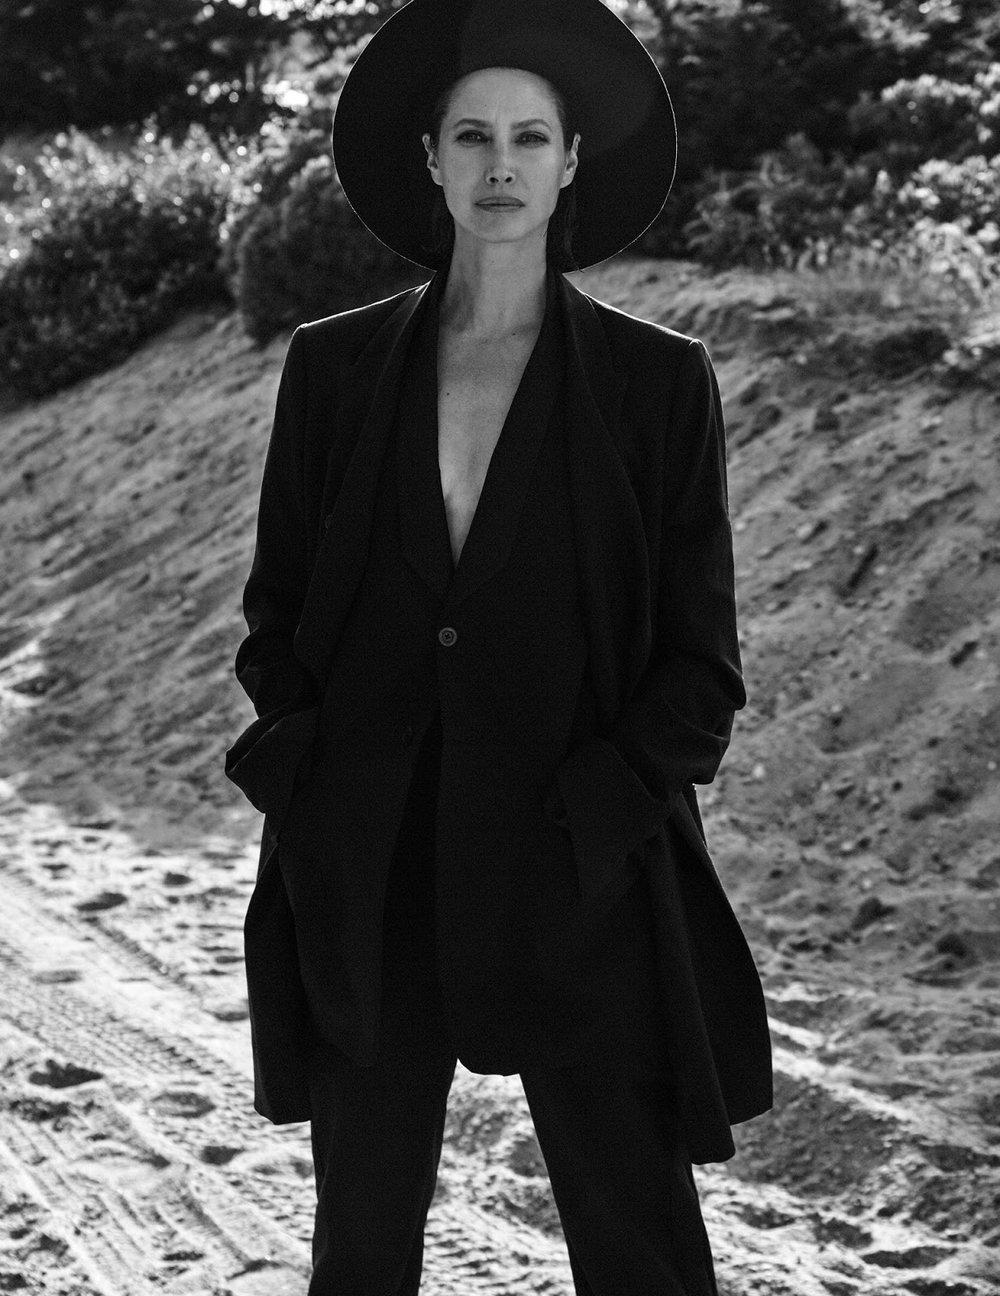 Christy Turlington by Chris Colls for Vogue Poland September 2018 (19).jpg